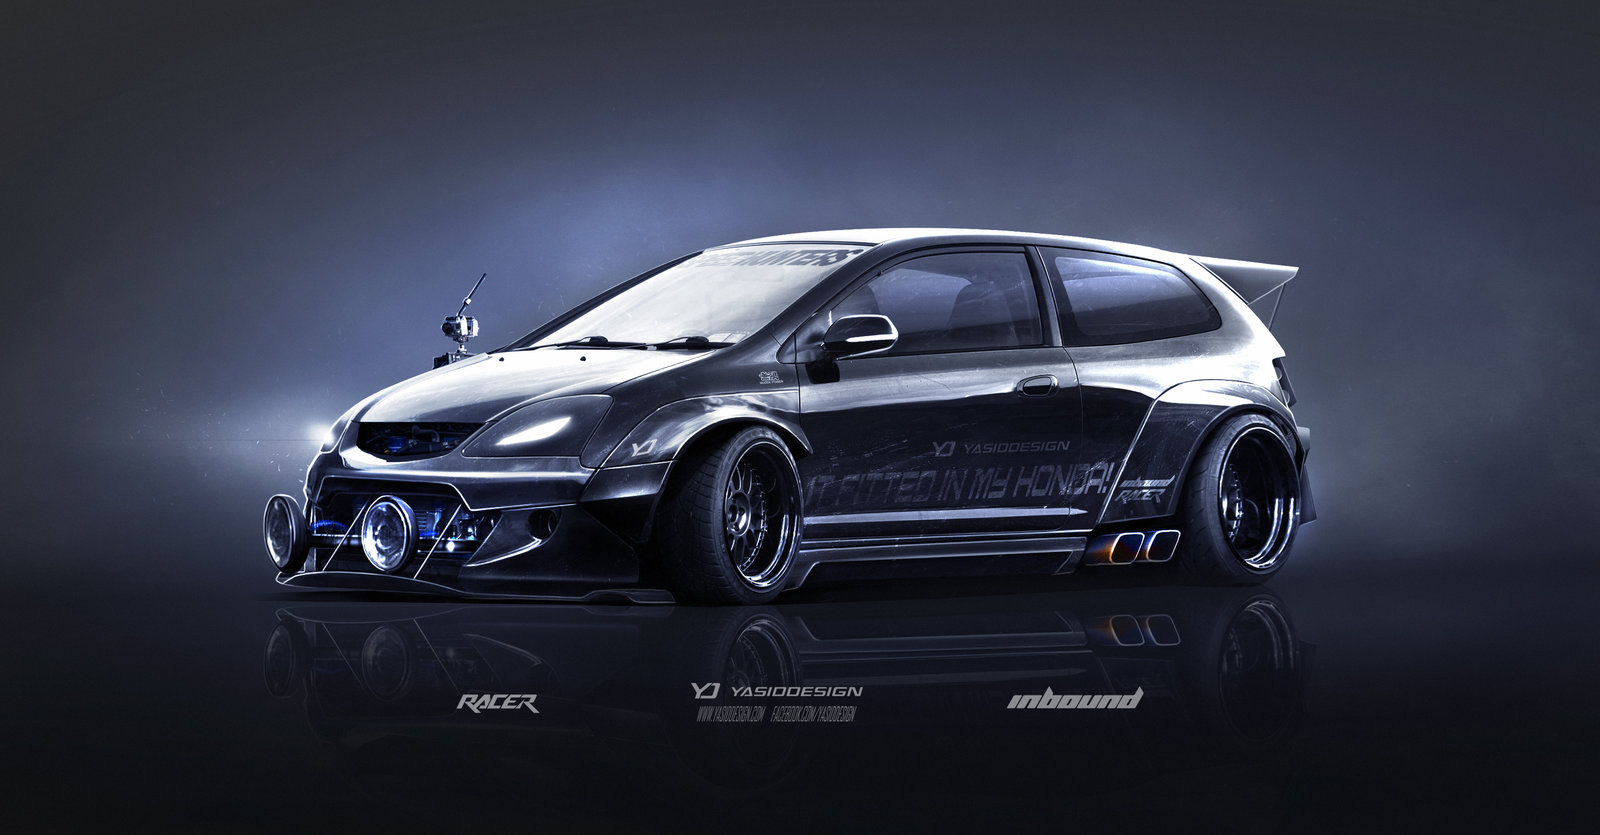 Honda Type R (EP3) Inbound racer